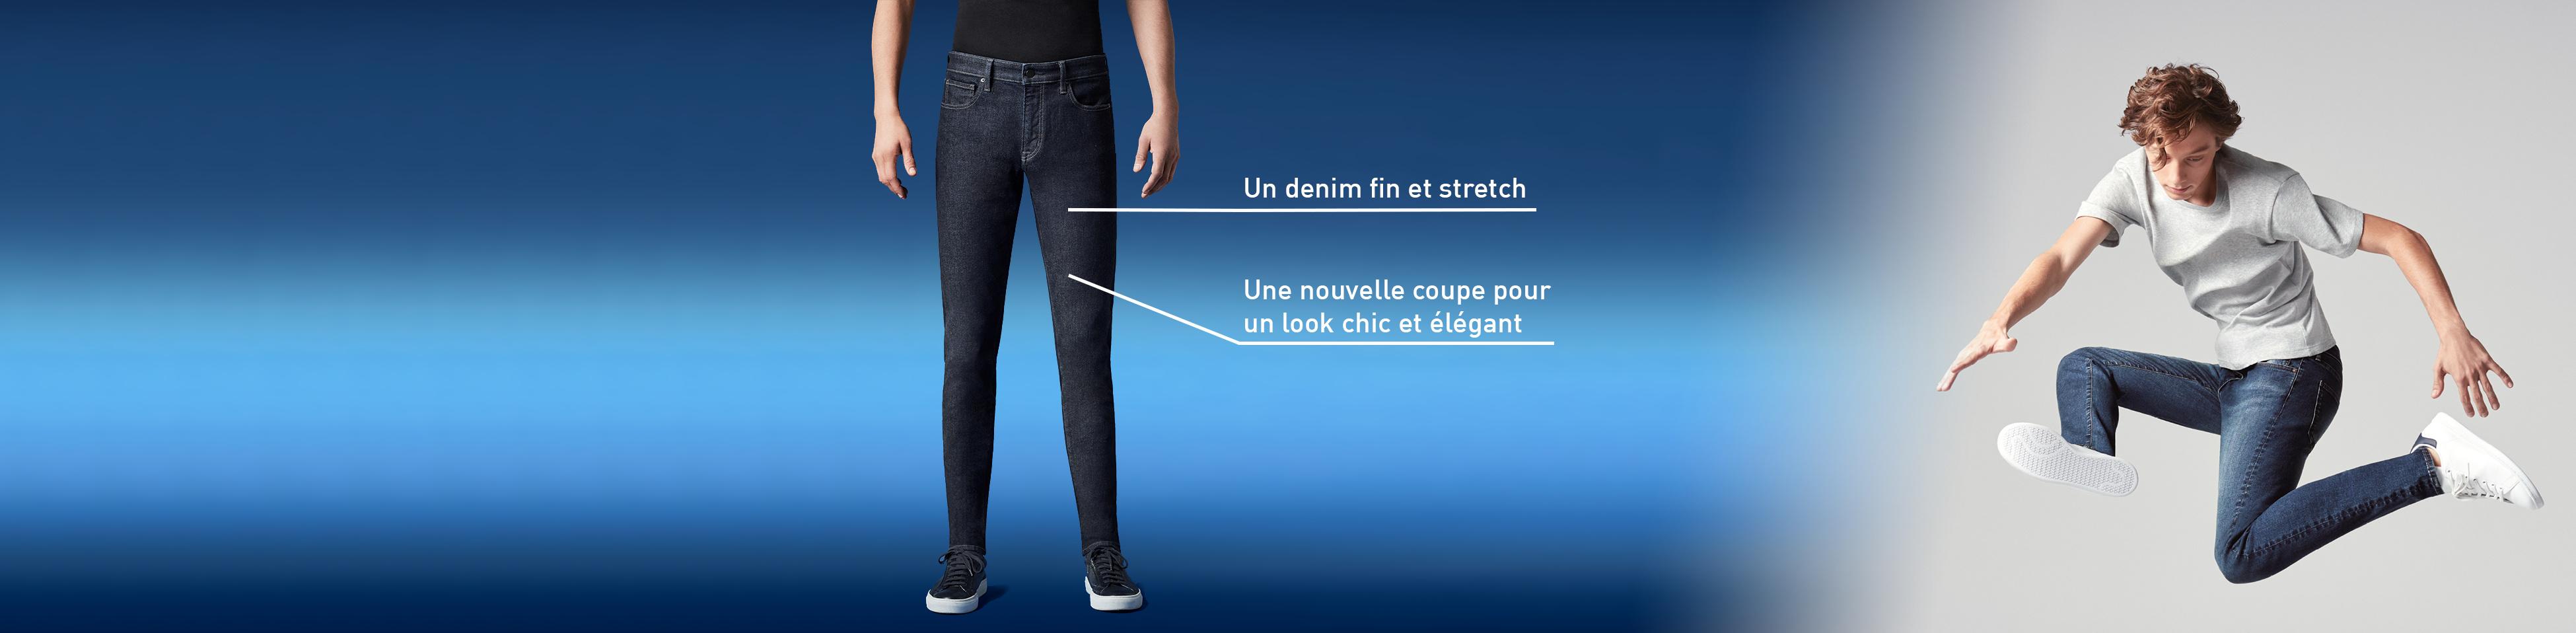 ultra stretch skinny fit